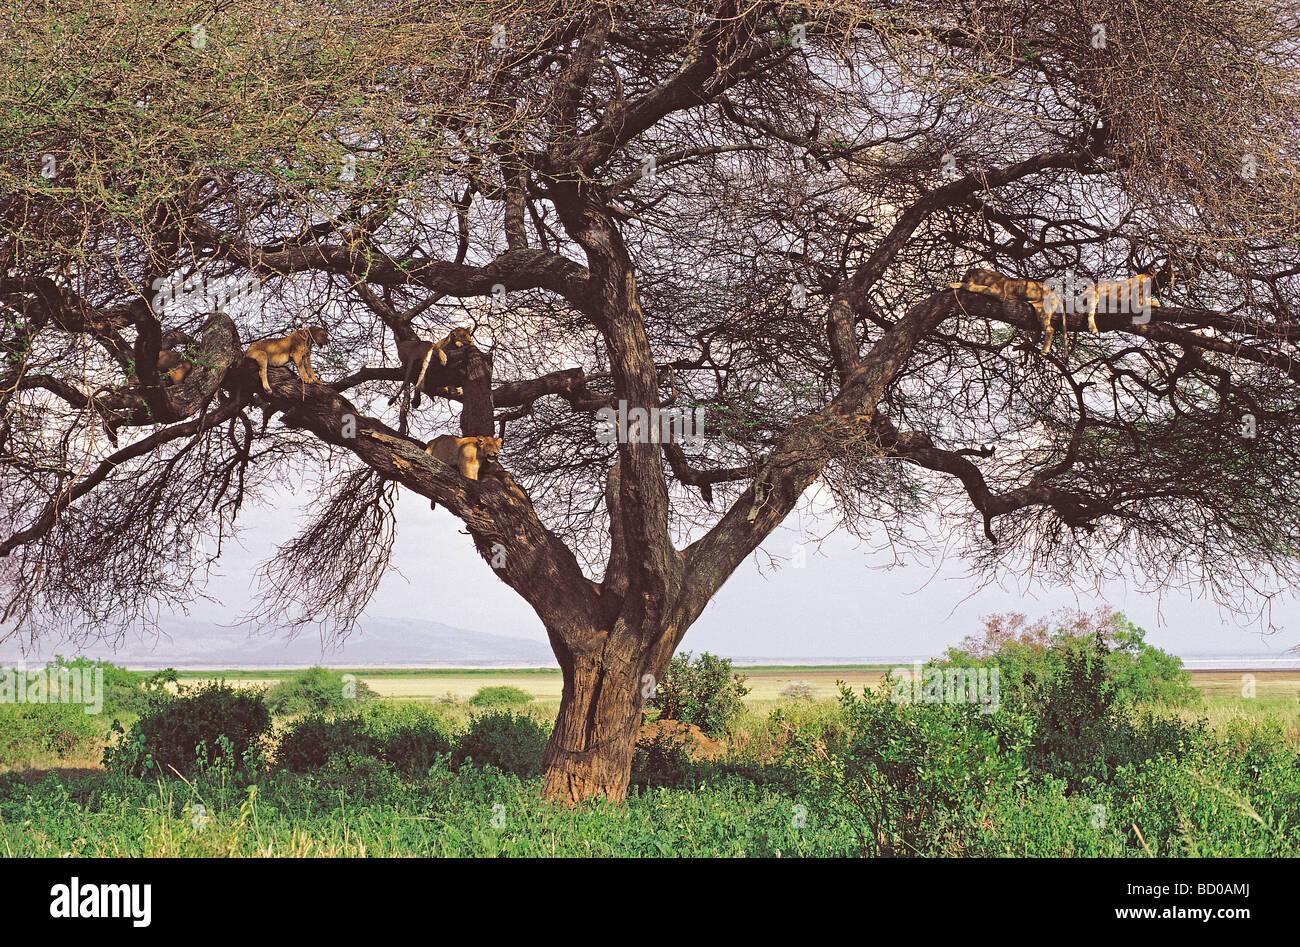 Six tree climbing lions resting on the braches of Acacia tortilis tree in Lake Manyara National Park Tanzania East - Stock Image